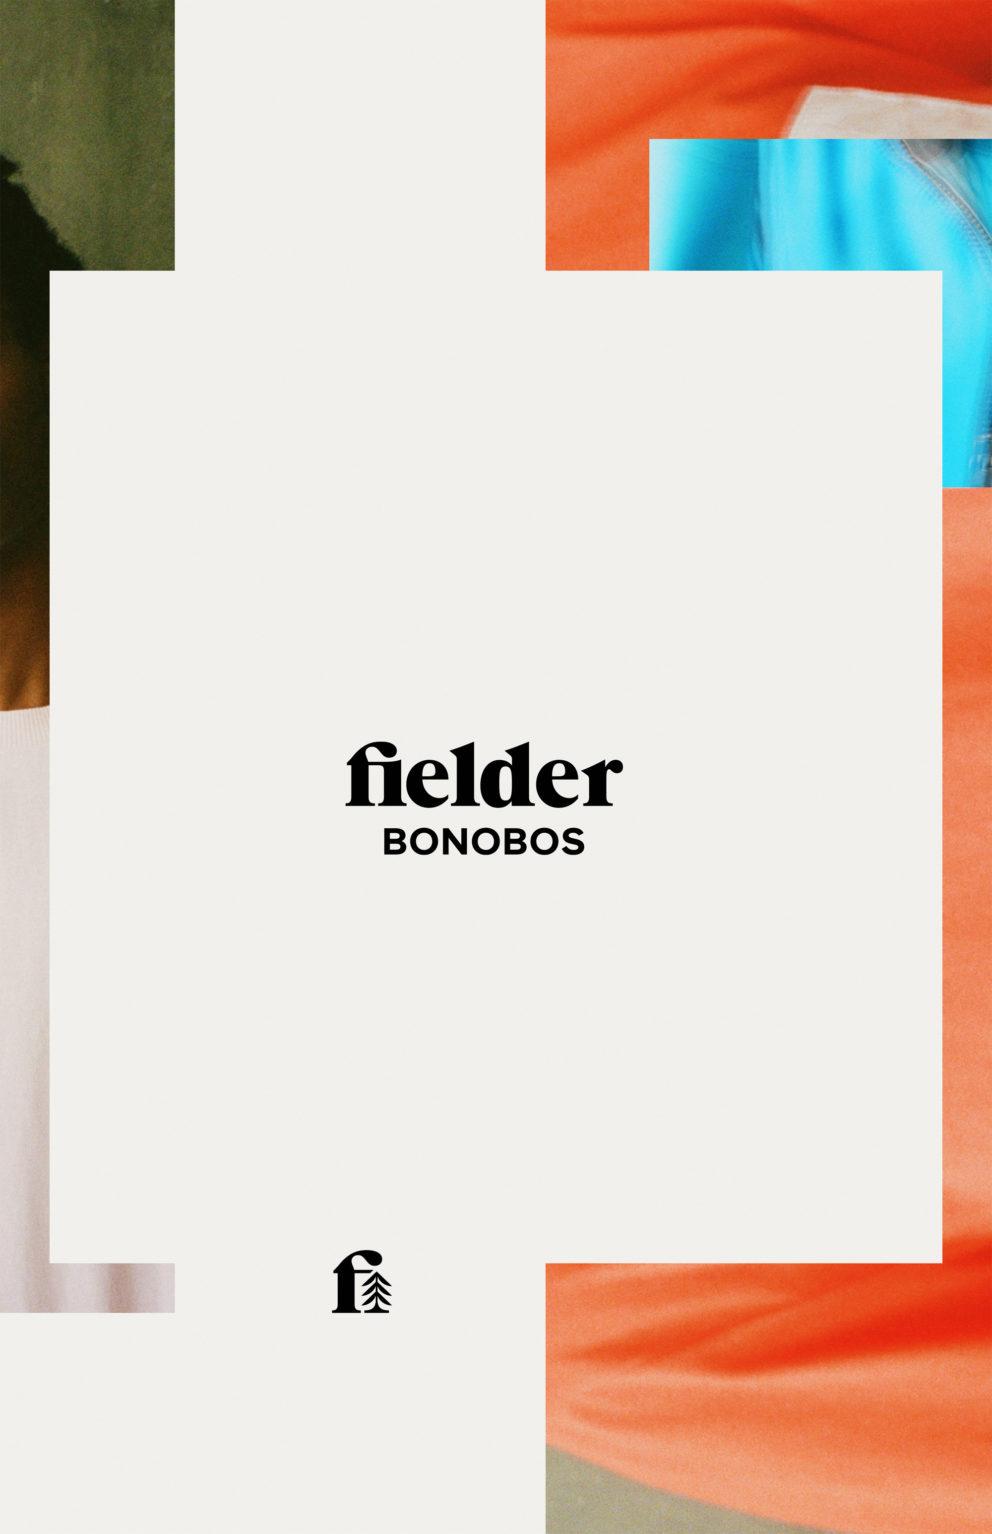 210611 Bnbs Fielder Lb 00 Cover